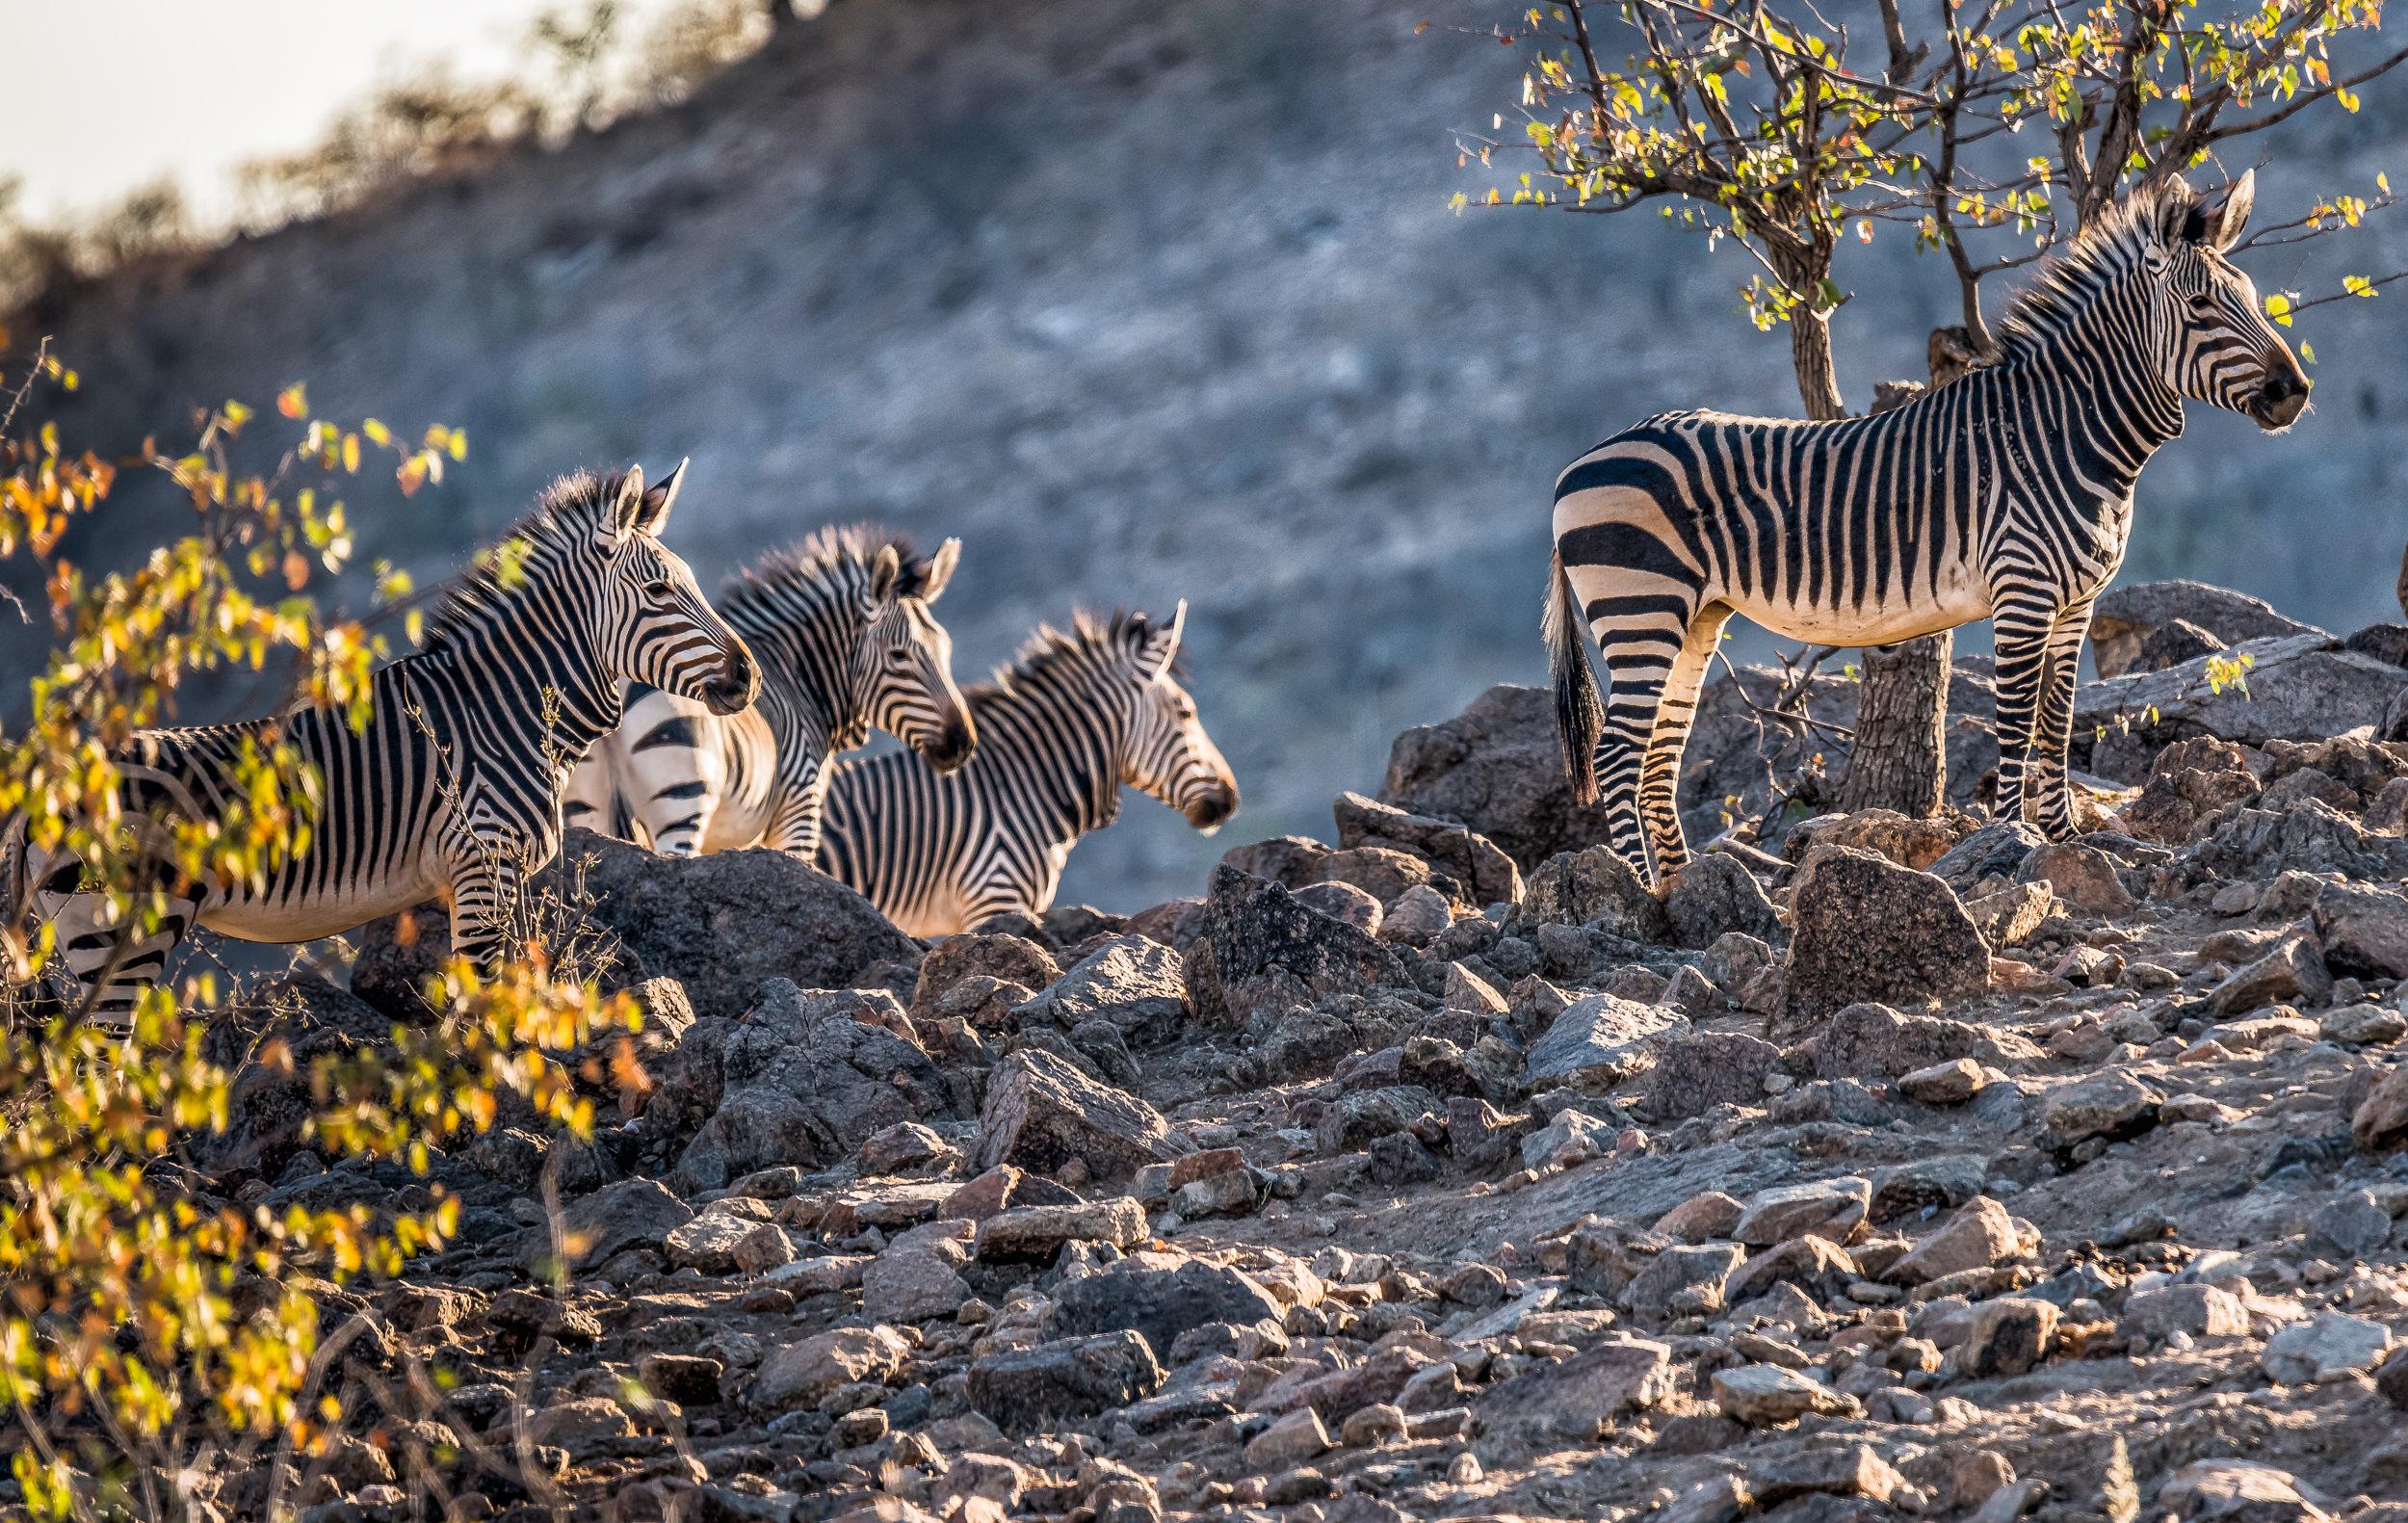 [2016 06 20] Namibia Hobatere Lodge (NIKON D810) 5103-Edit.jpg